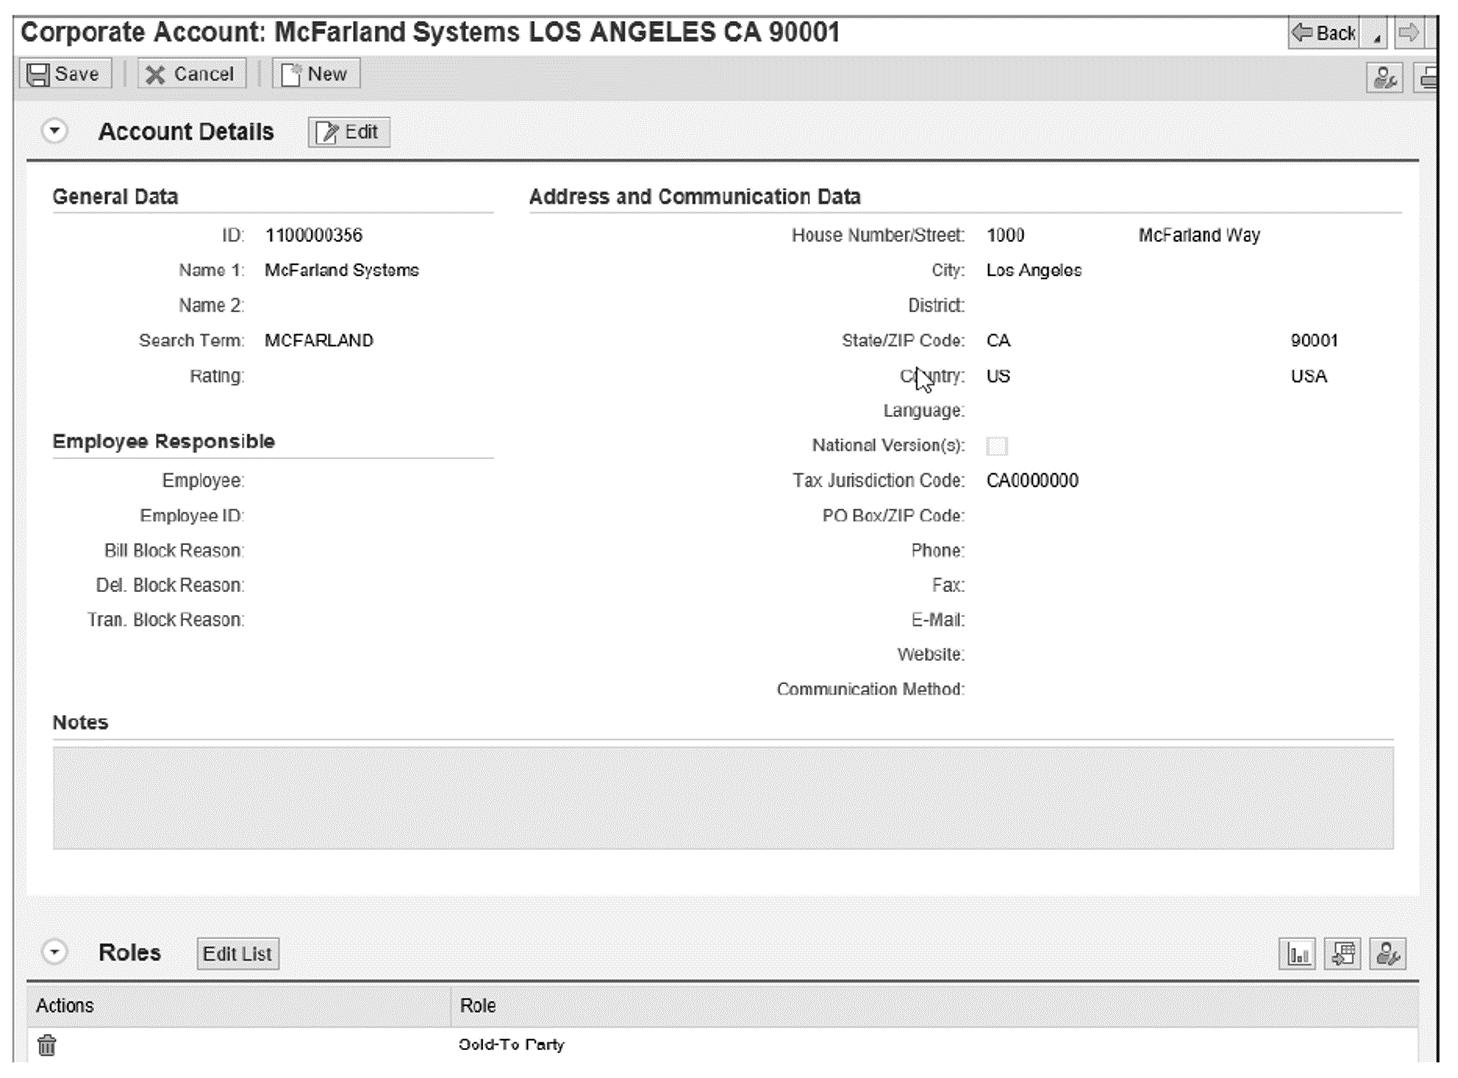 Business Partner Details: McFarland Systems, Screen 1